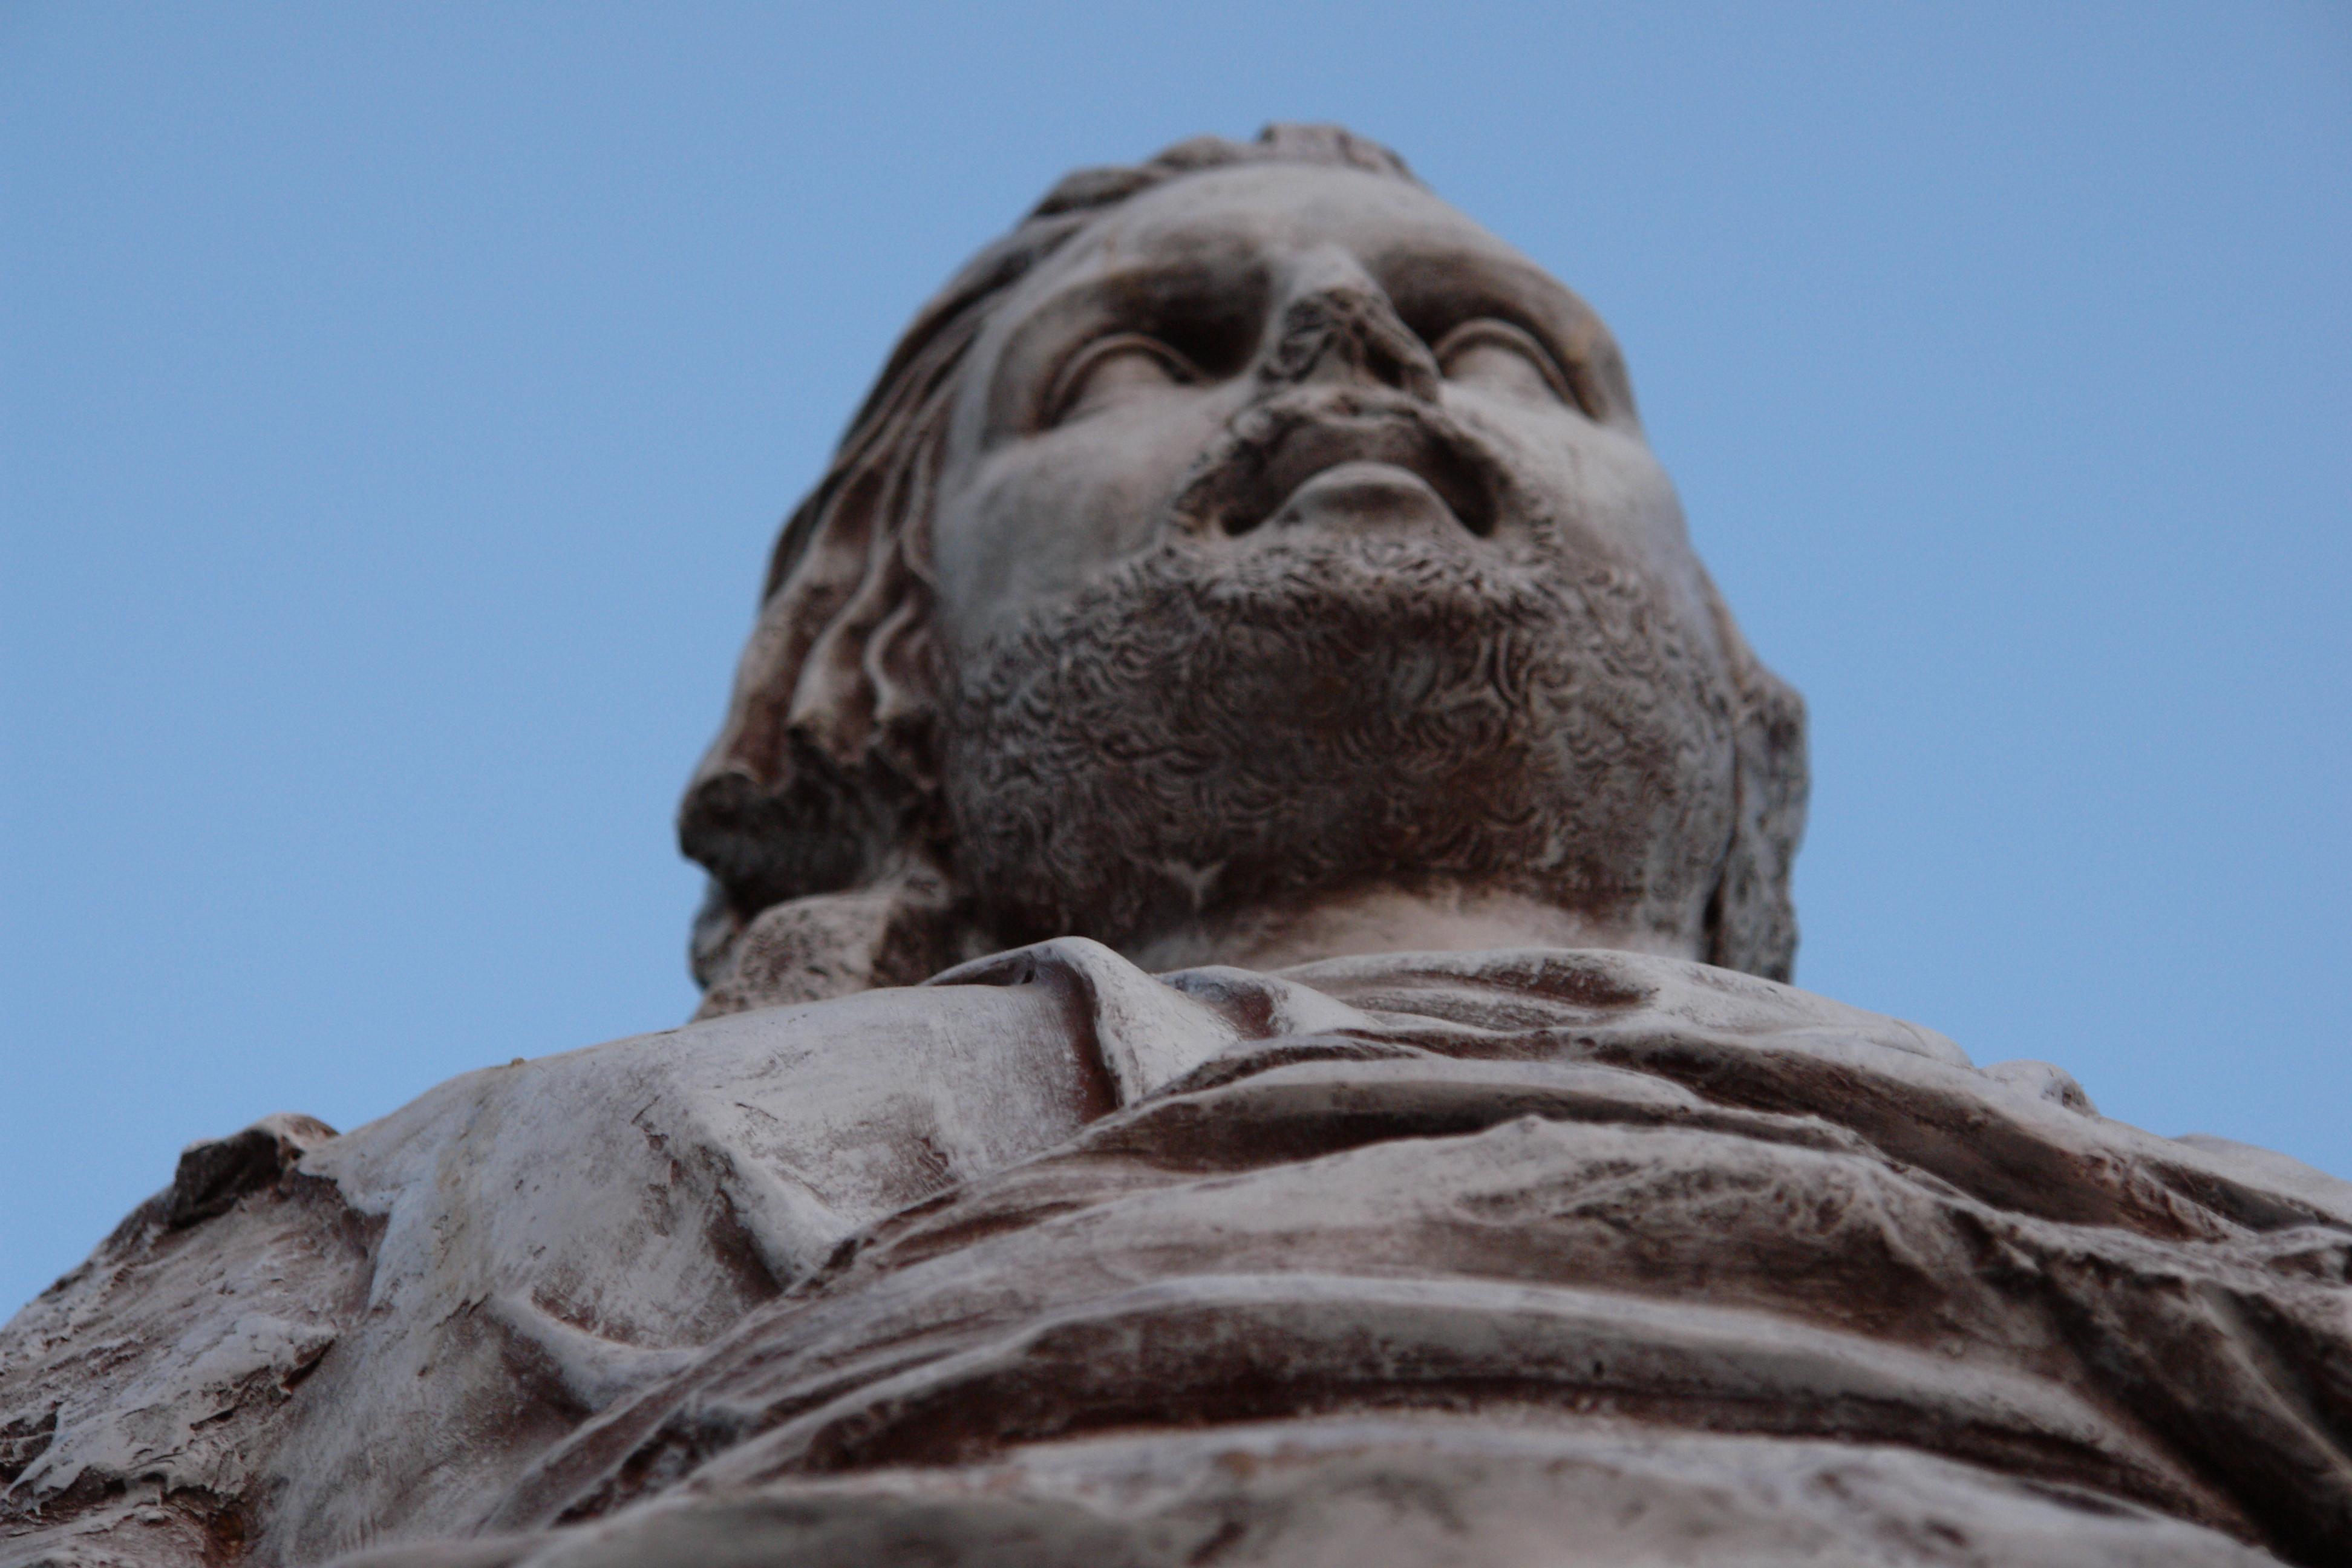 Sculpture photo